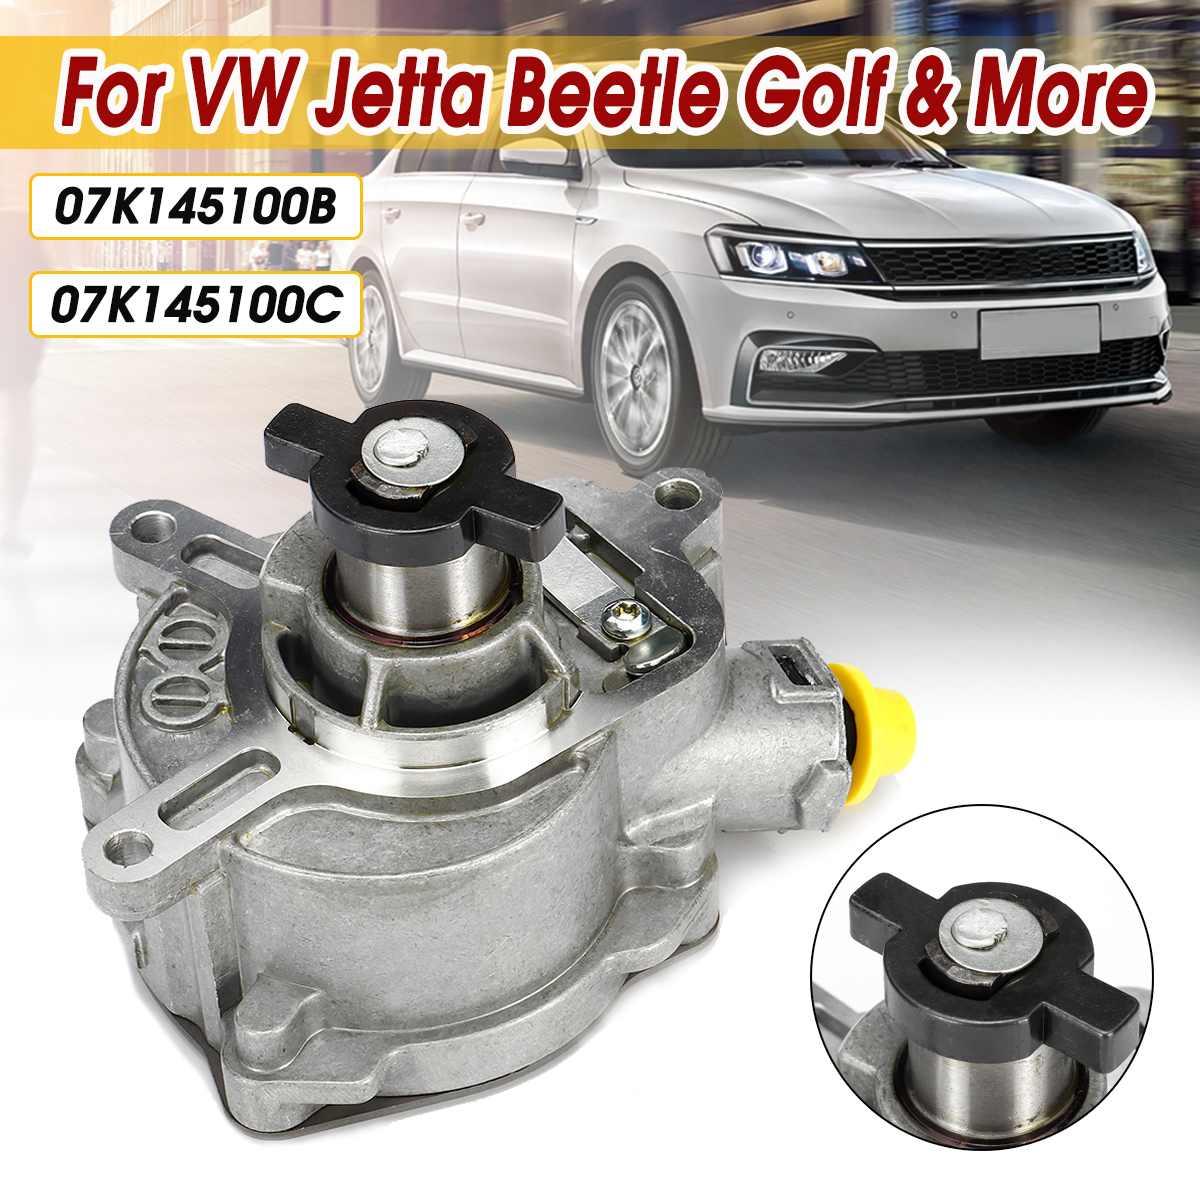 Vacuum Pump 07K145100B 07K145100C For VW For Jetta/Beetle/Golf/Passat/Rabbit